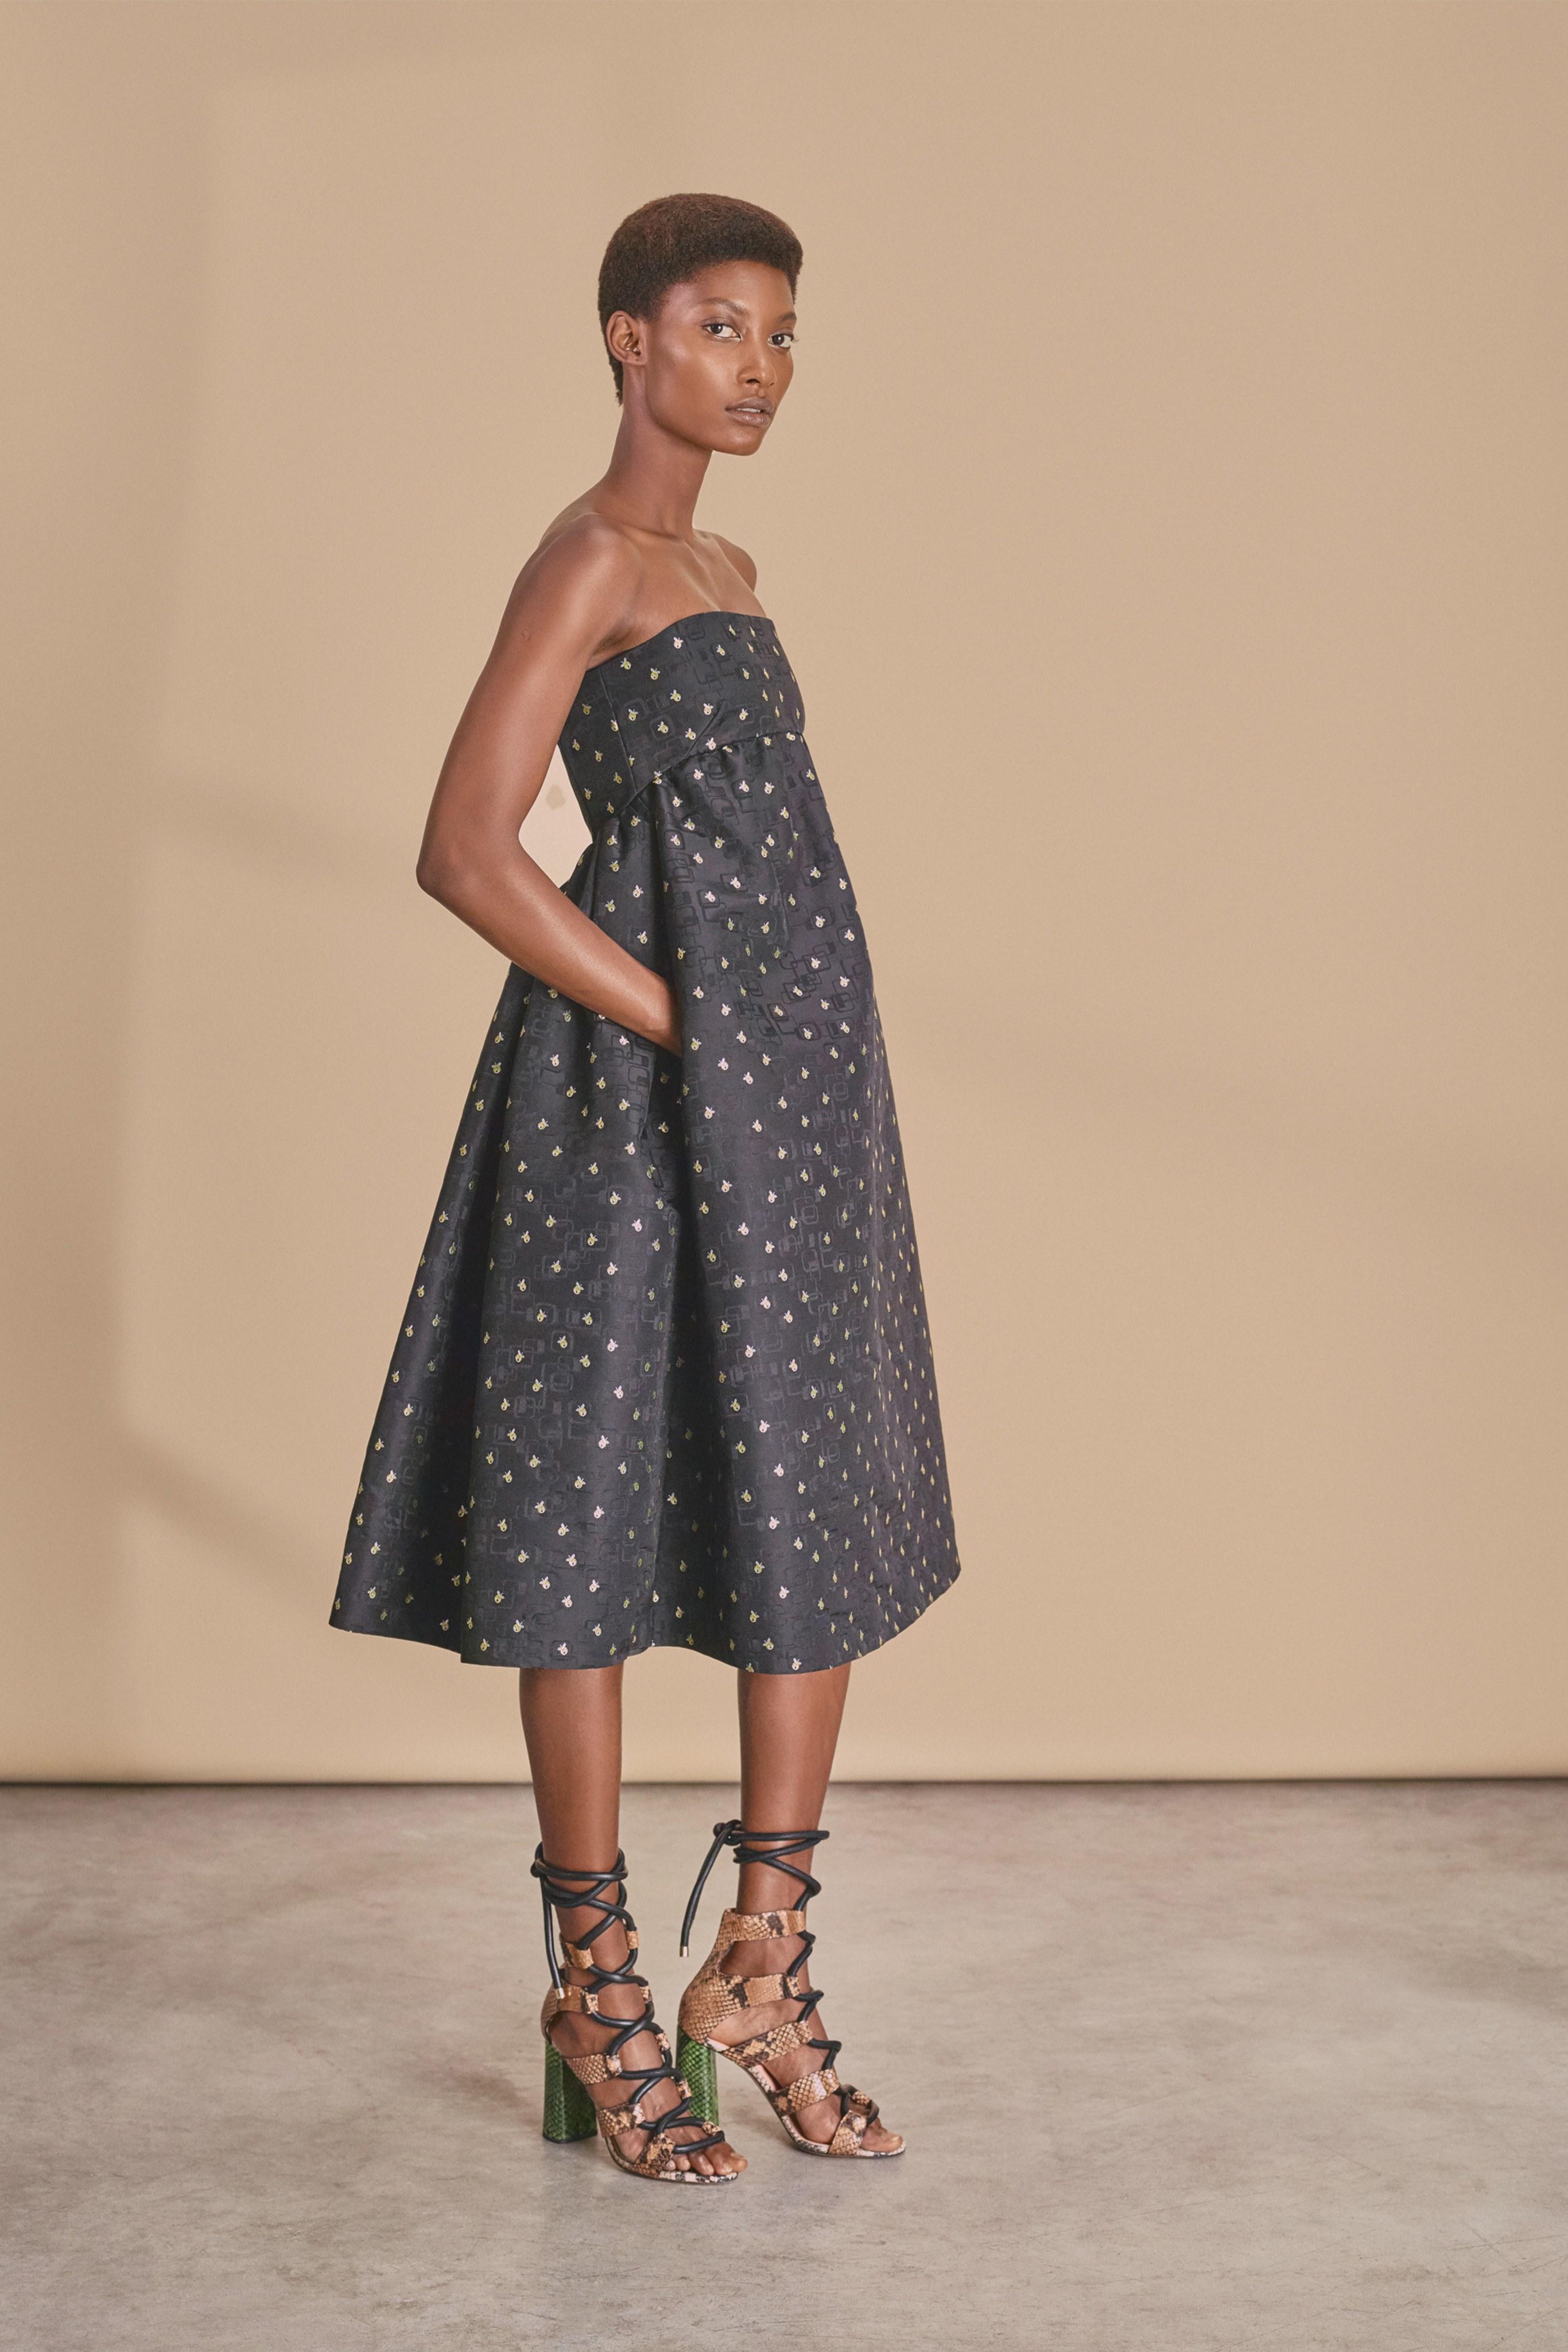 Voluminous Dress Spring 2019 High heels snake print black dress rochas 2019